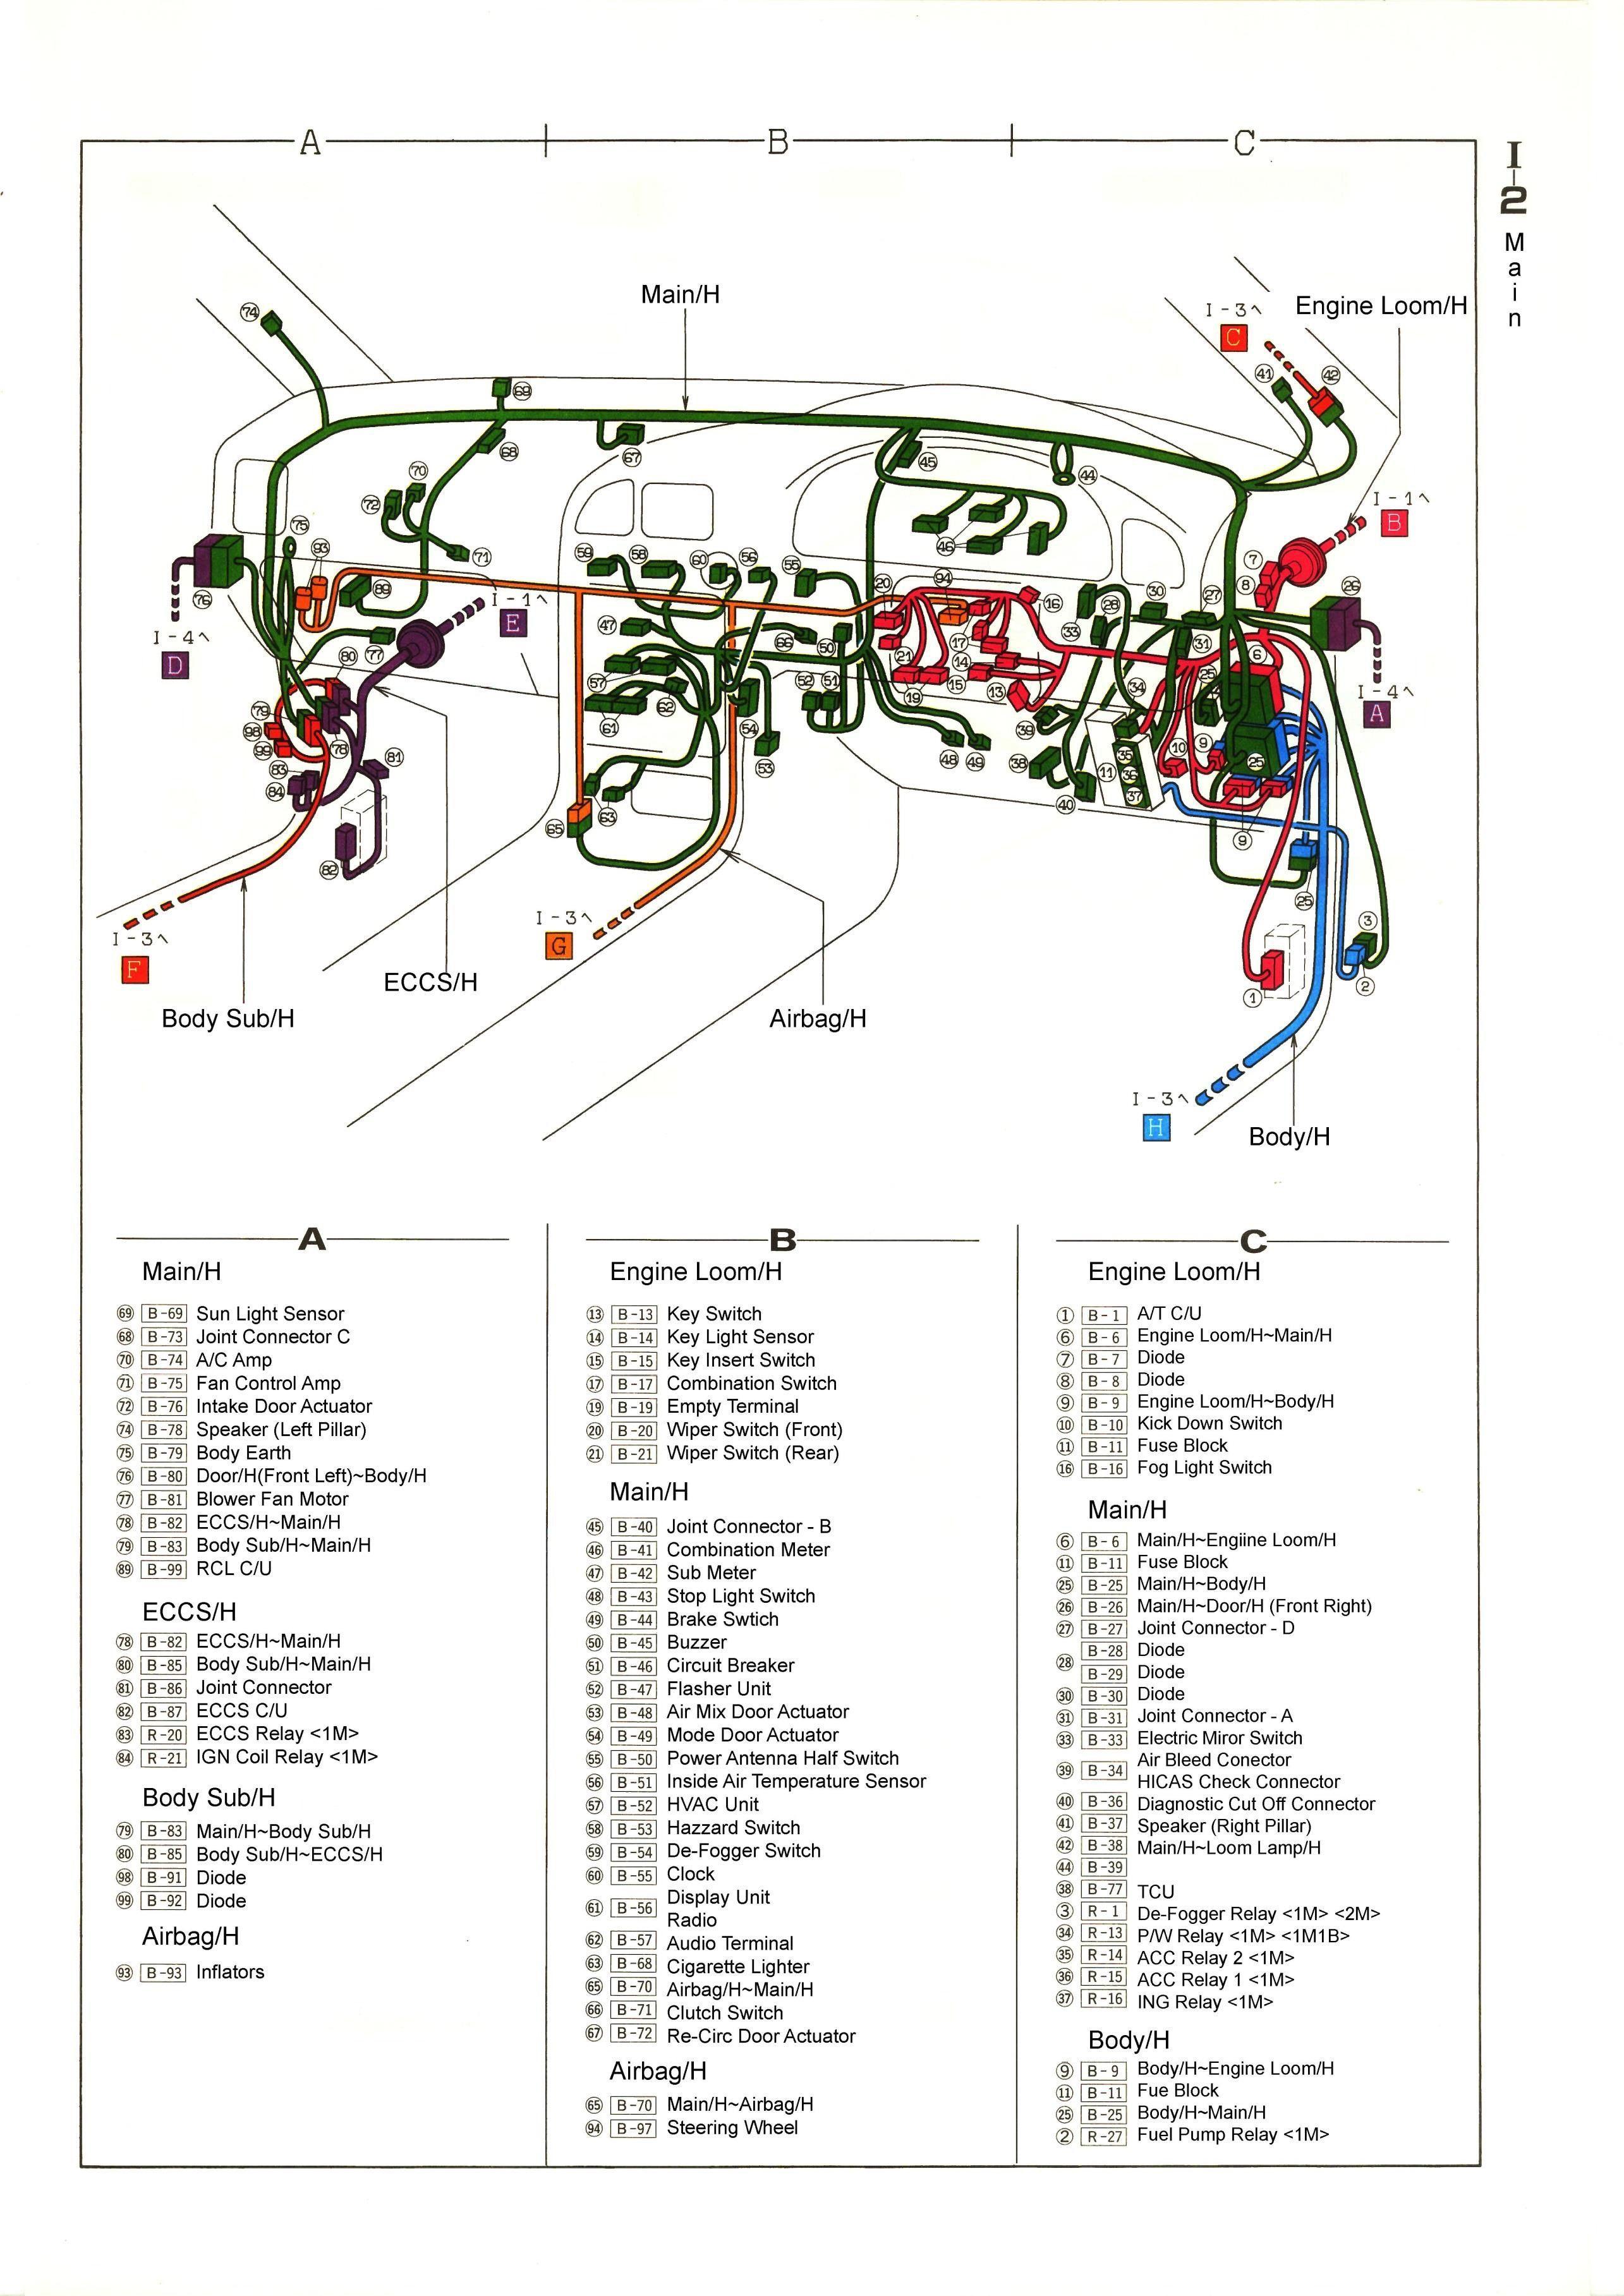 Fog Light Wiring Diagram For 1966 Mustang R32 Skyline Engineering Nissan Skyline Gt